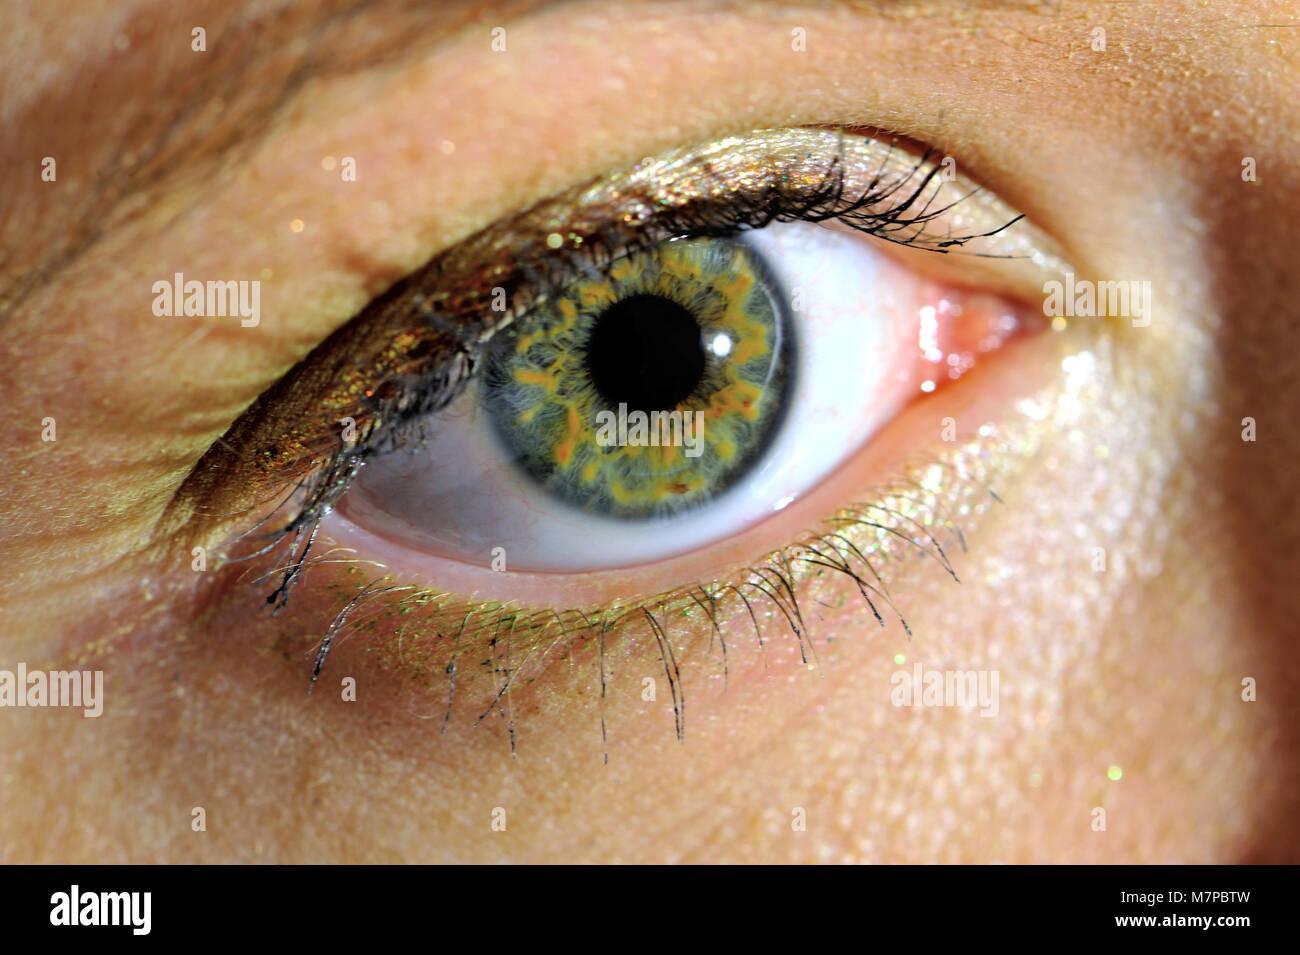 organ, sight, eye, eyes, color, perception, sense, human, person, frame, focus, health, human, people, women, - Stock Image